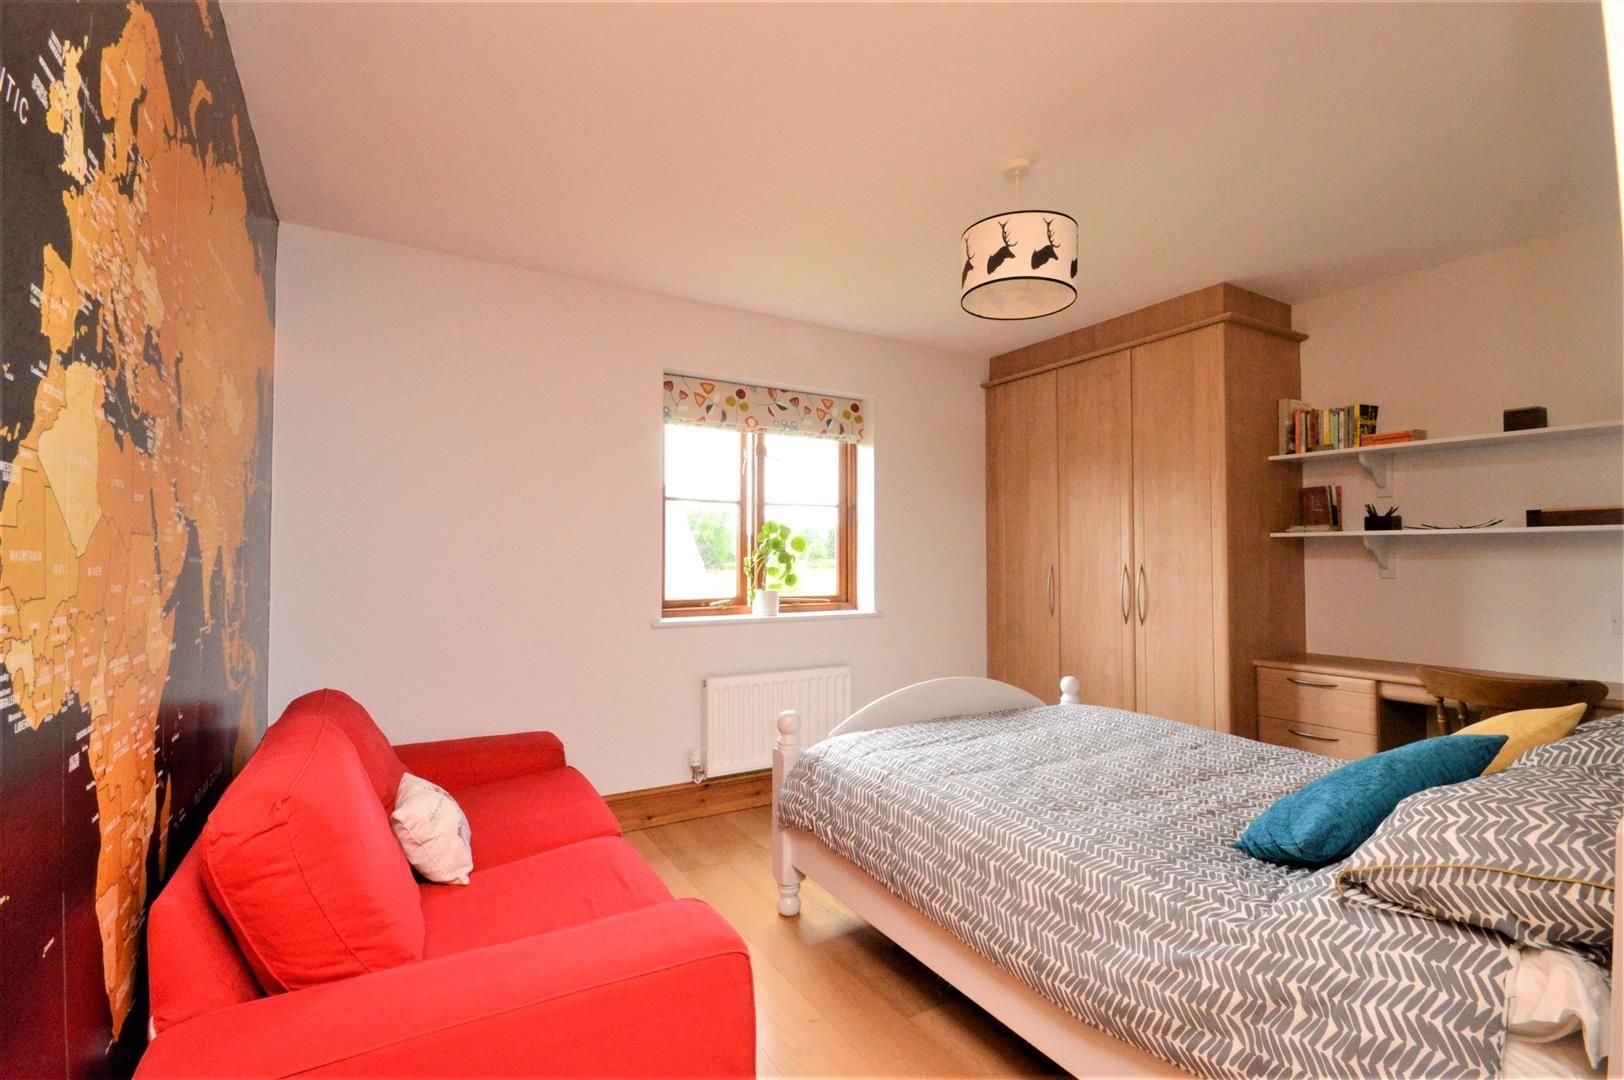 4 bed detached for sale in Eardisley 11